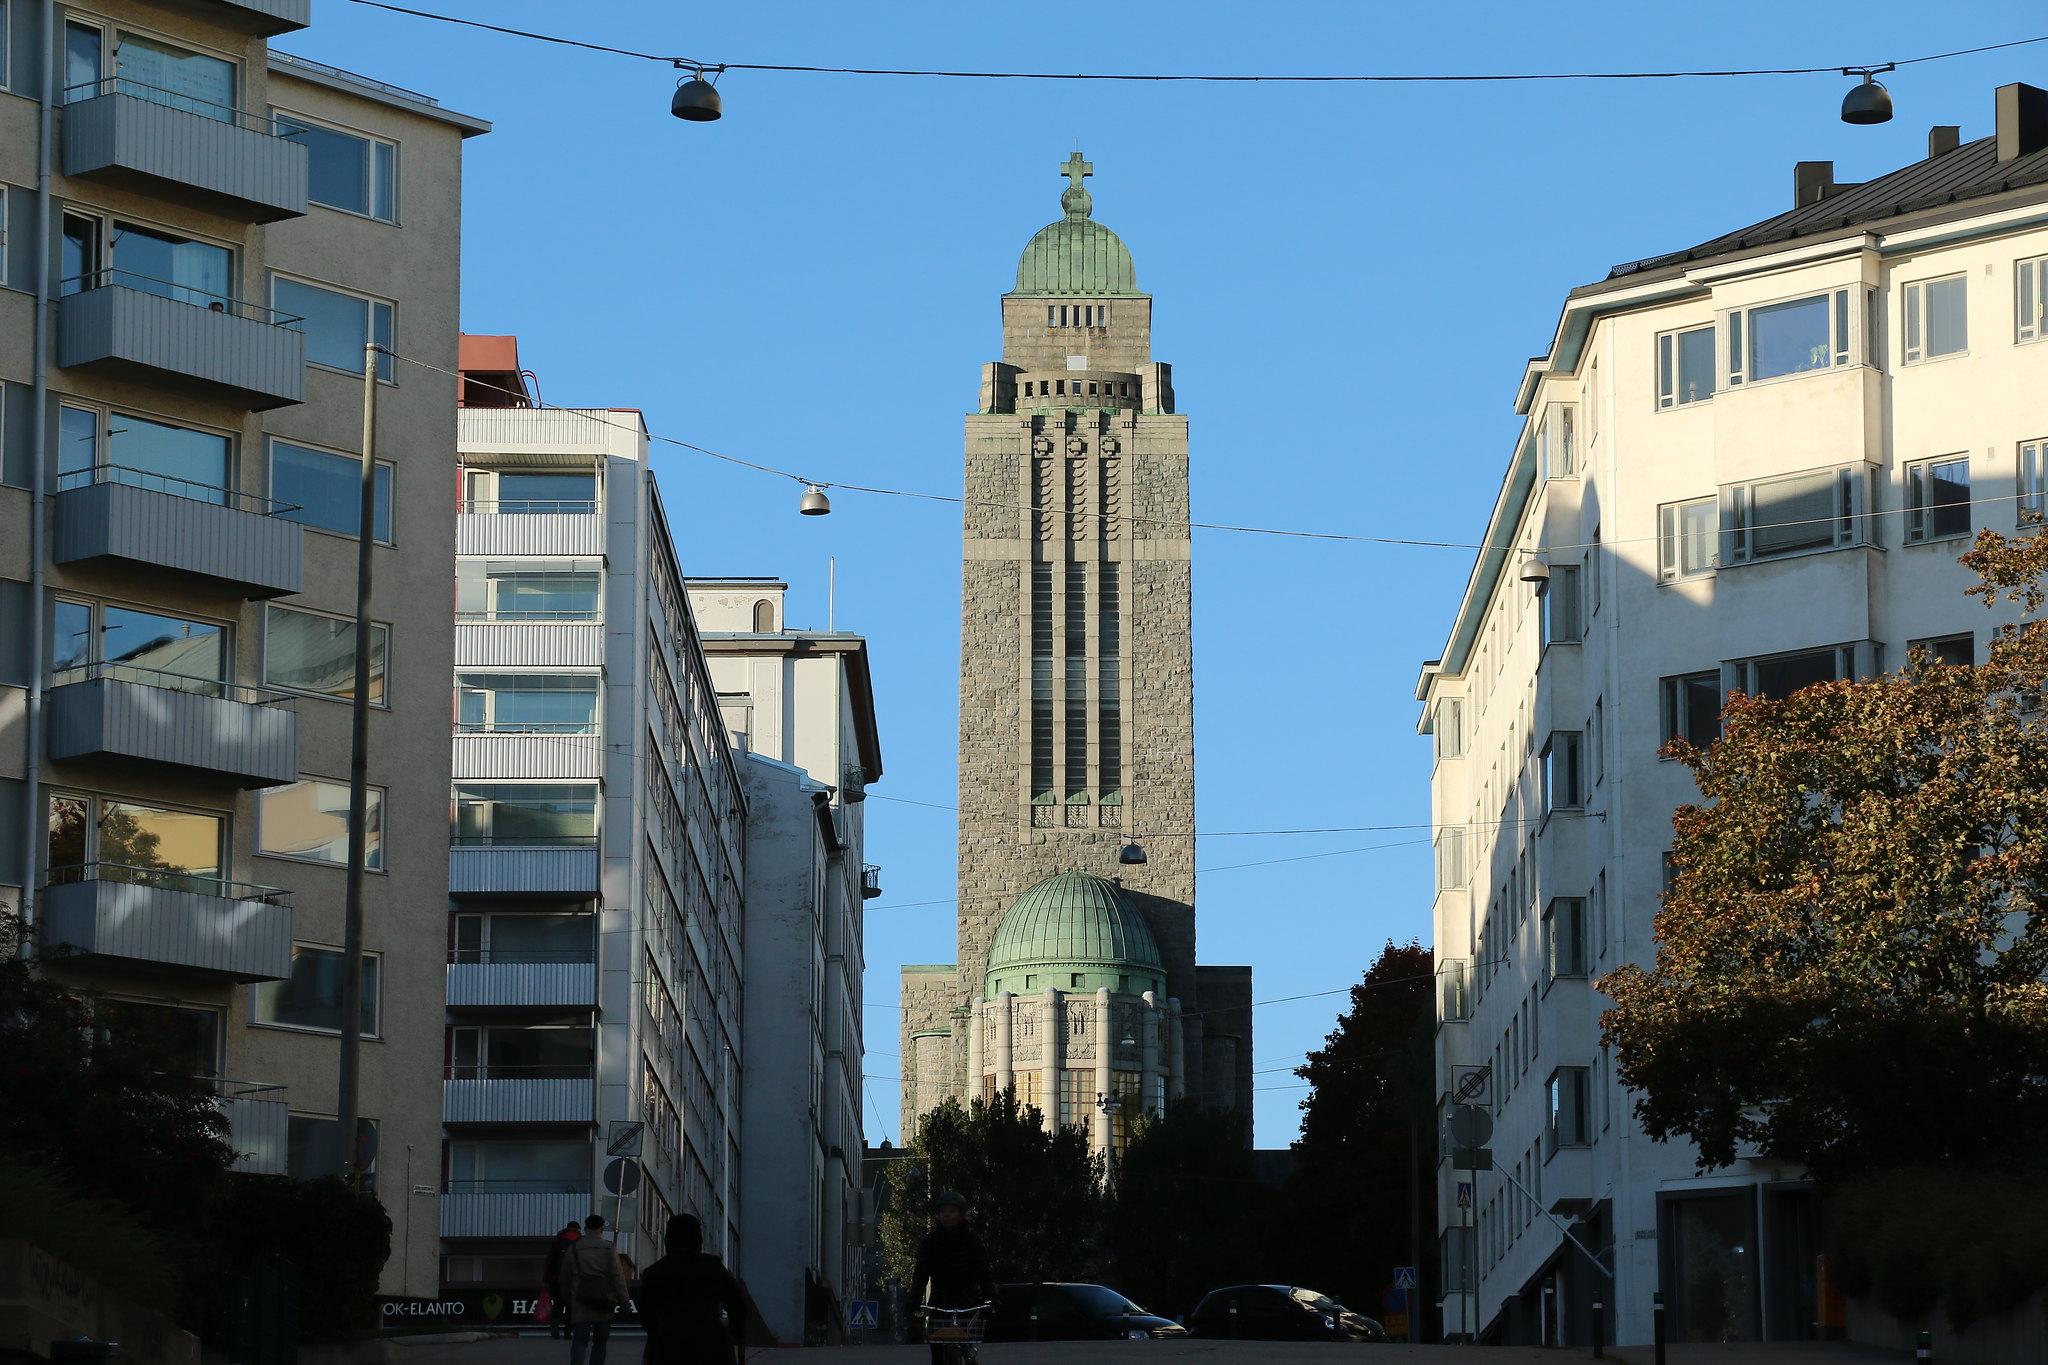 Helsinki_okt18_619